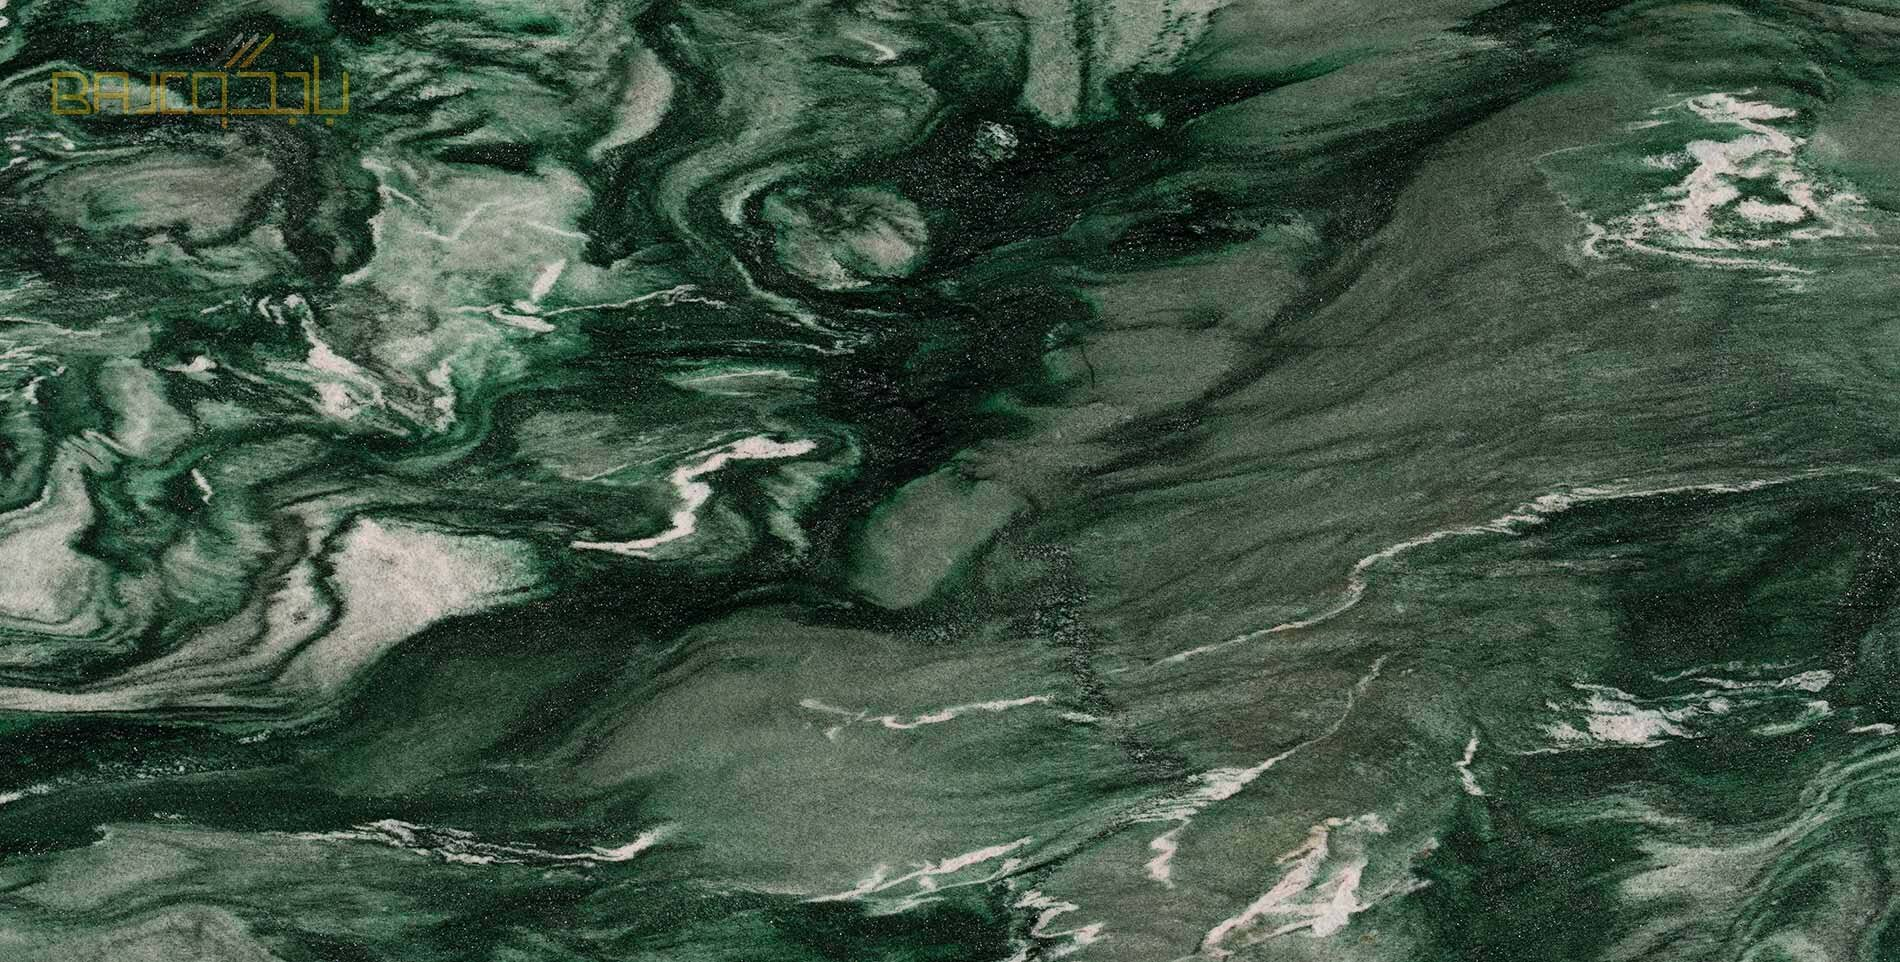 Verde-Lapponia-فيرد-لابونيا